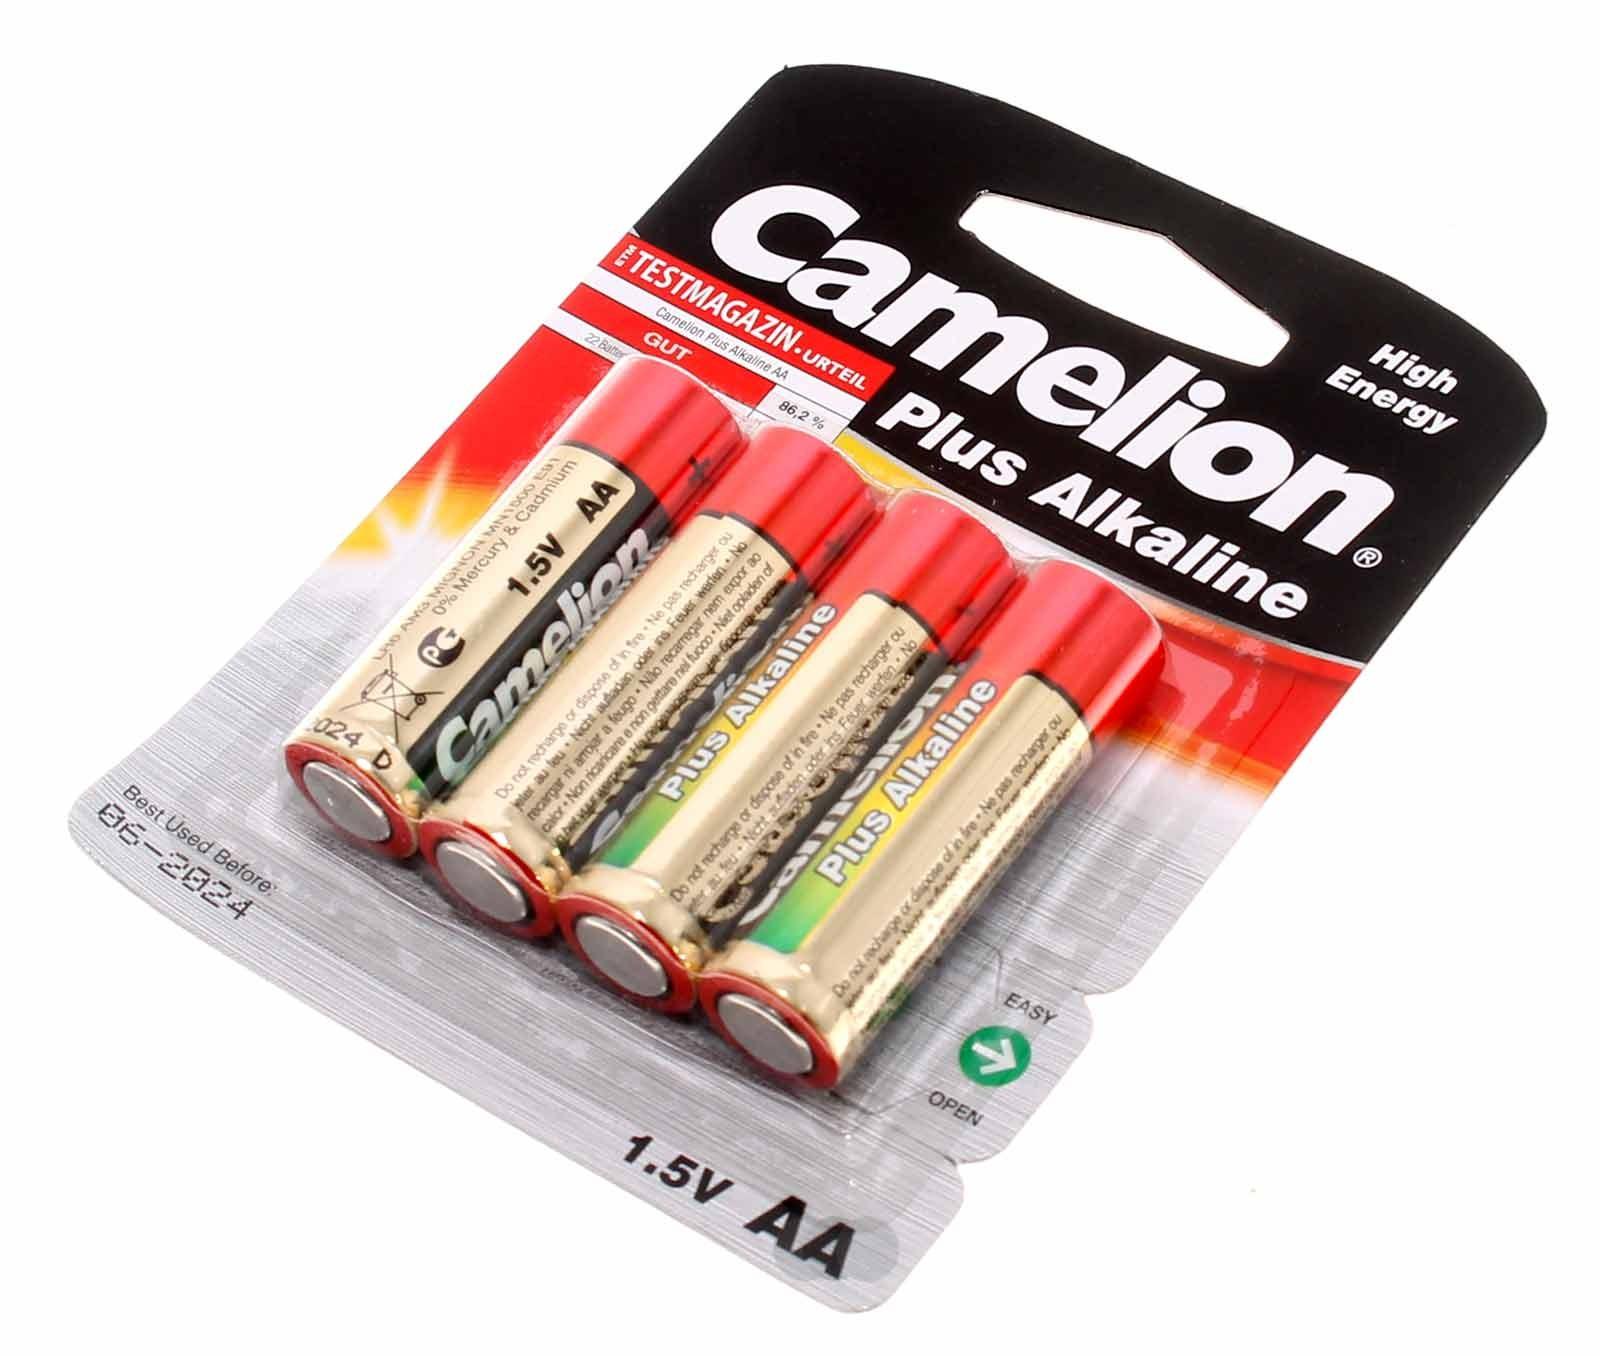 camelion batterie 1 5v aa mignon 2700mah lr6 bp4 lr6 am3 mn1500 e91. Black Bedroom Furniture Sets. Home Design Ideas